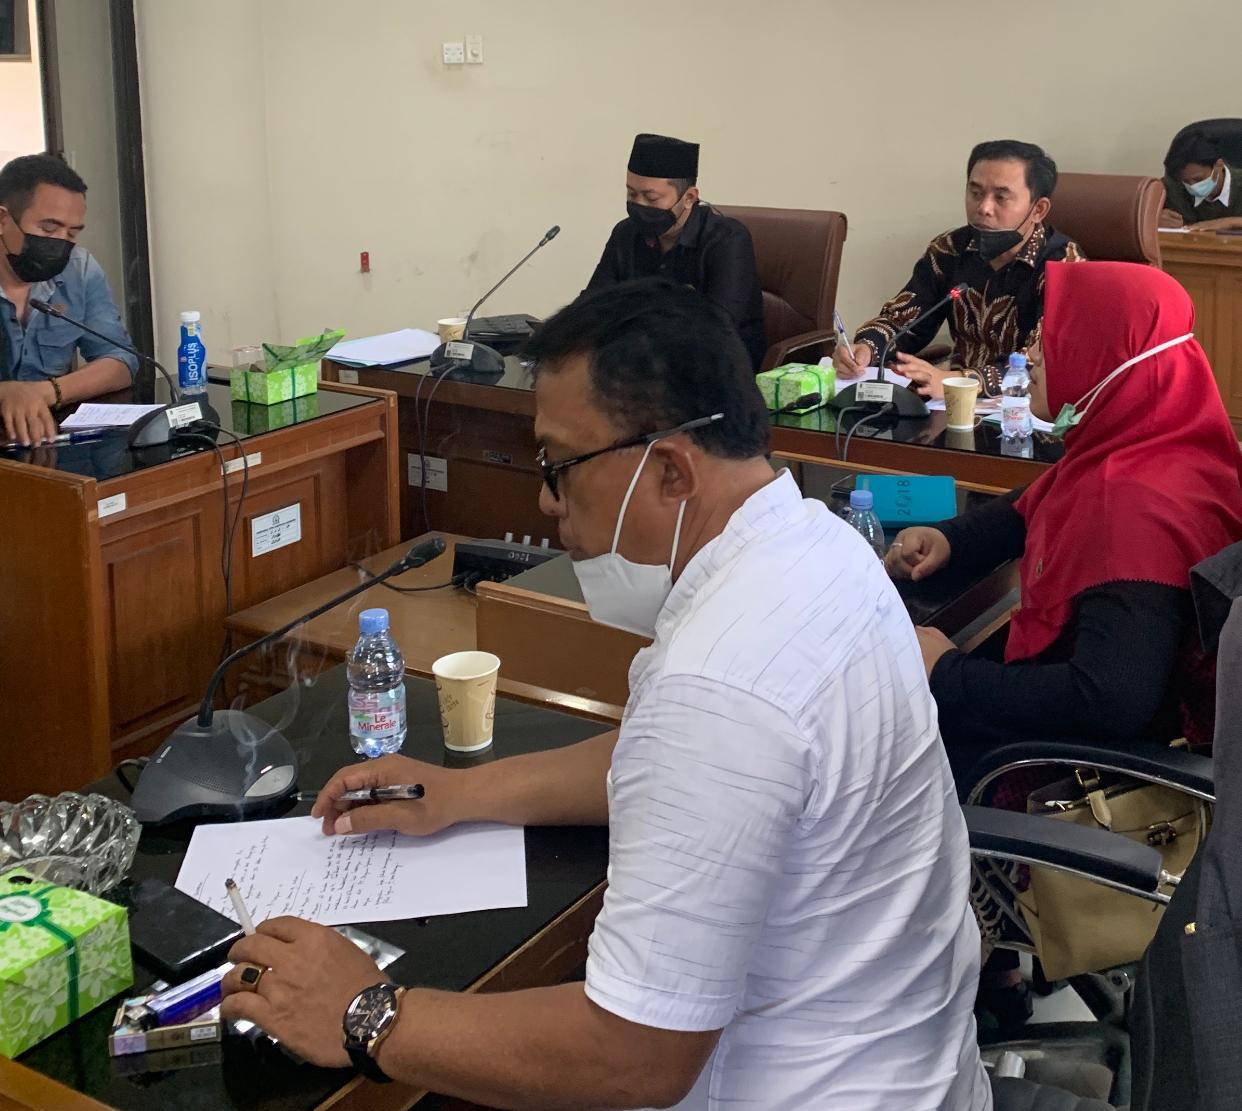 Ceceran Limbah B3 di Warung Bambu, Komisi III DPRD Karawang Akan Panggil PHE ONWJ